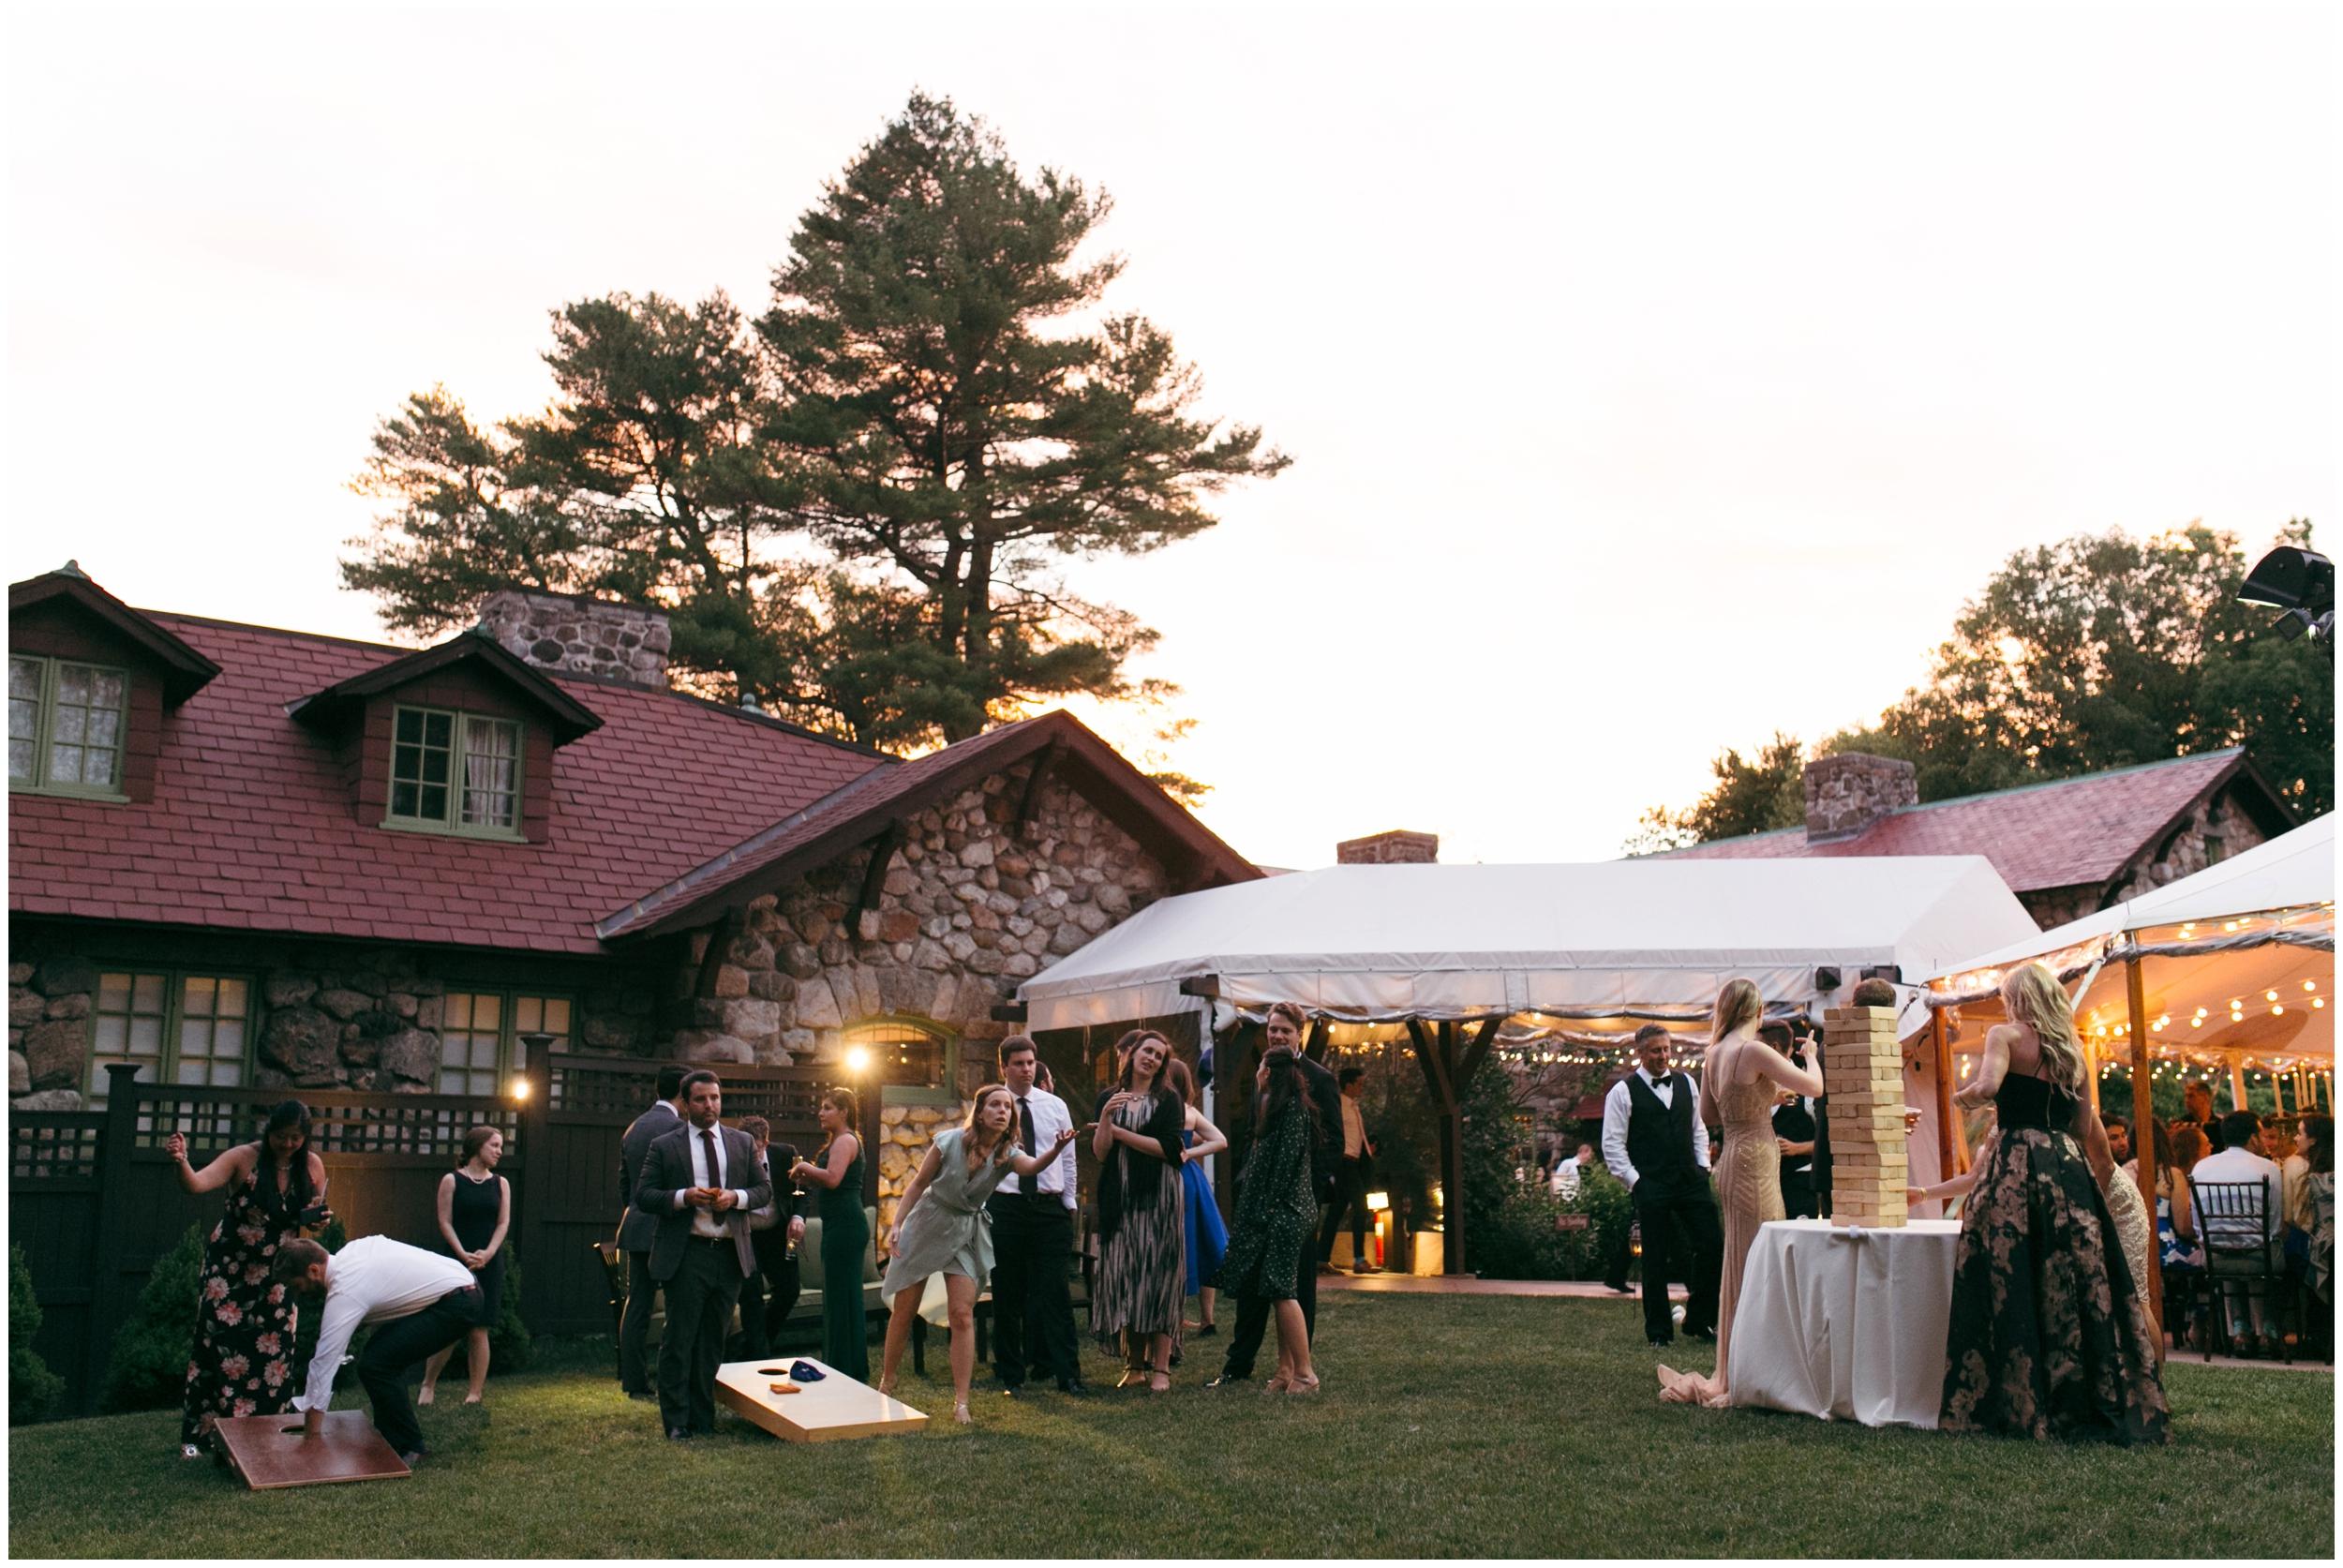 Willowdale-Estate-Wedding-Bailey-Q-Photo-Boston-Wedding-Photographer-091.JPG